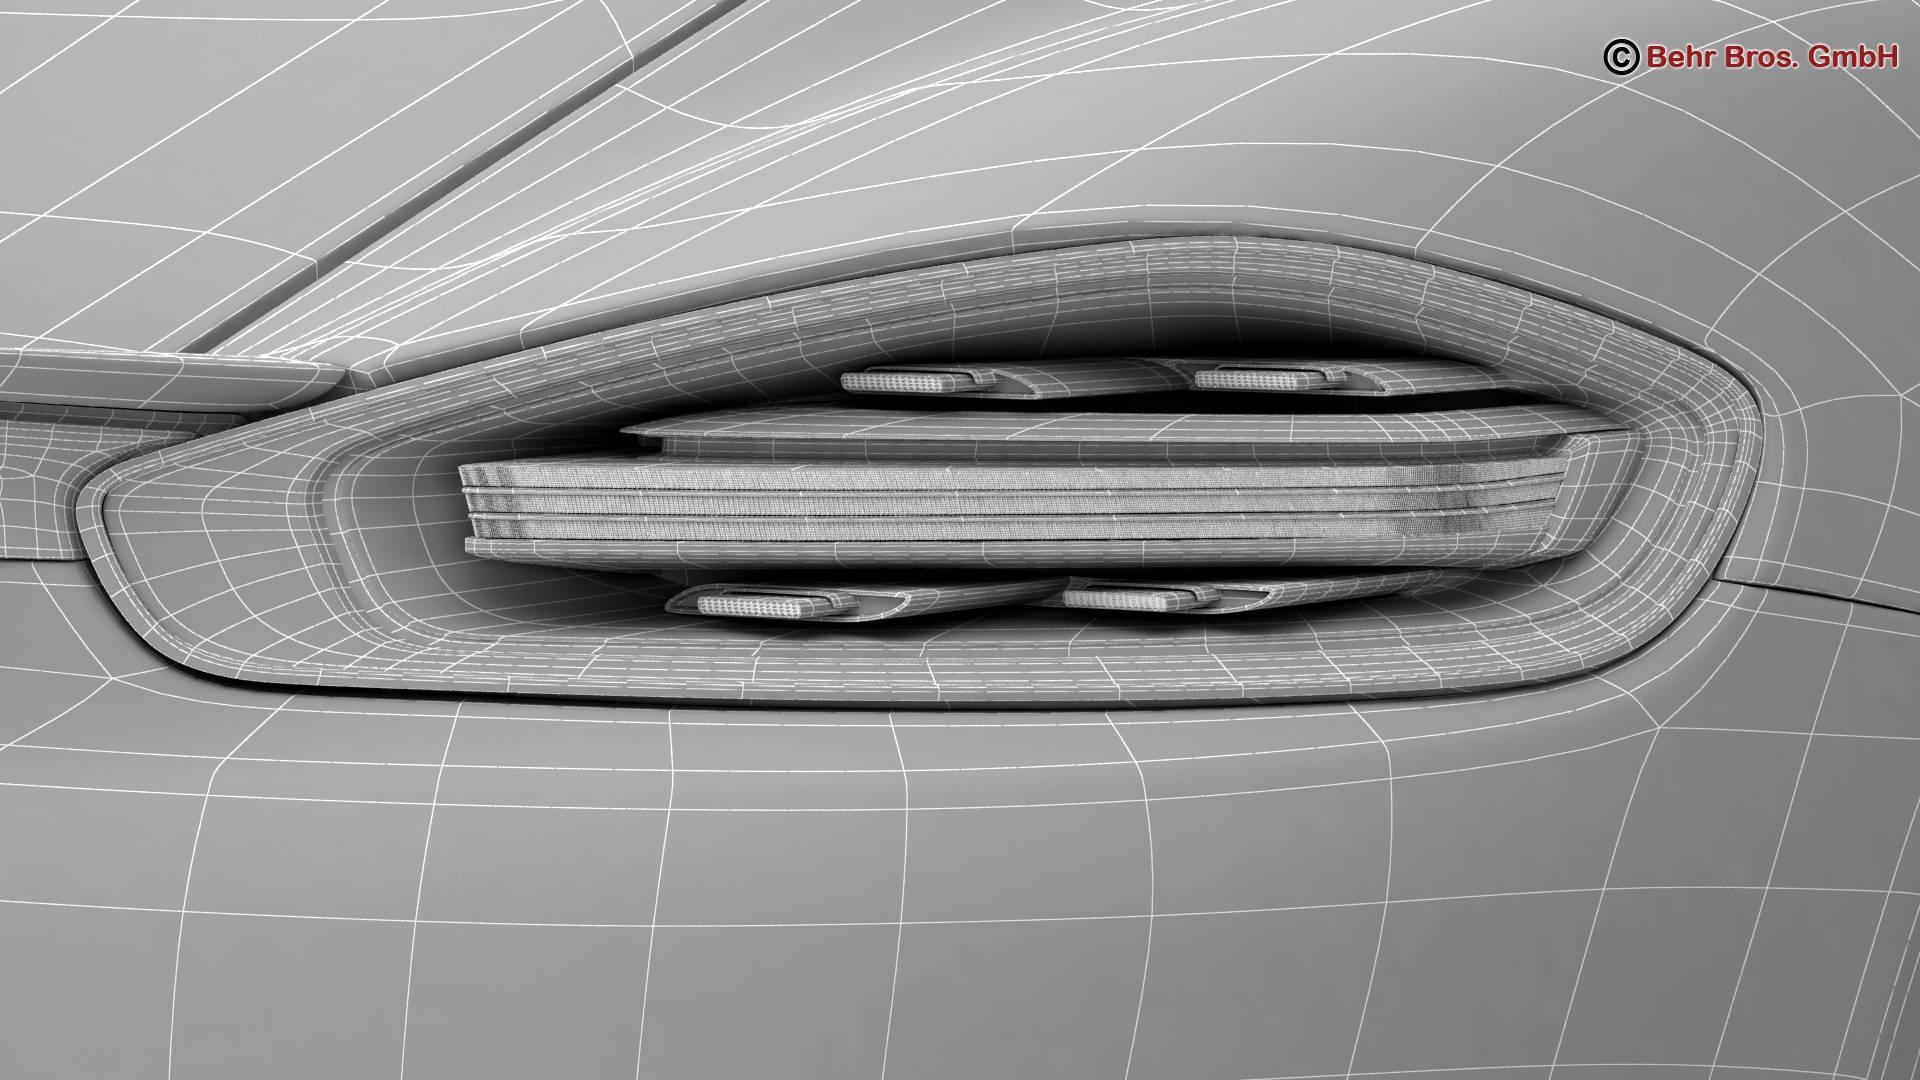 porsche 718 cayman s 2017 3d model 3ds max fbx c4d lwo ma mb obj 220127